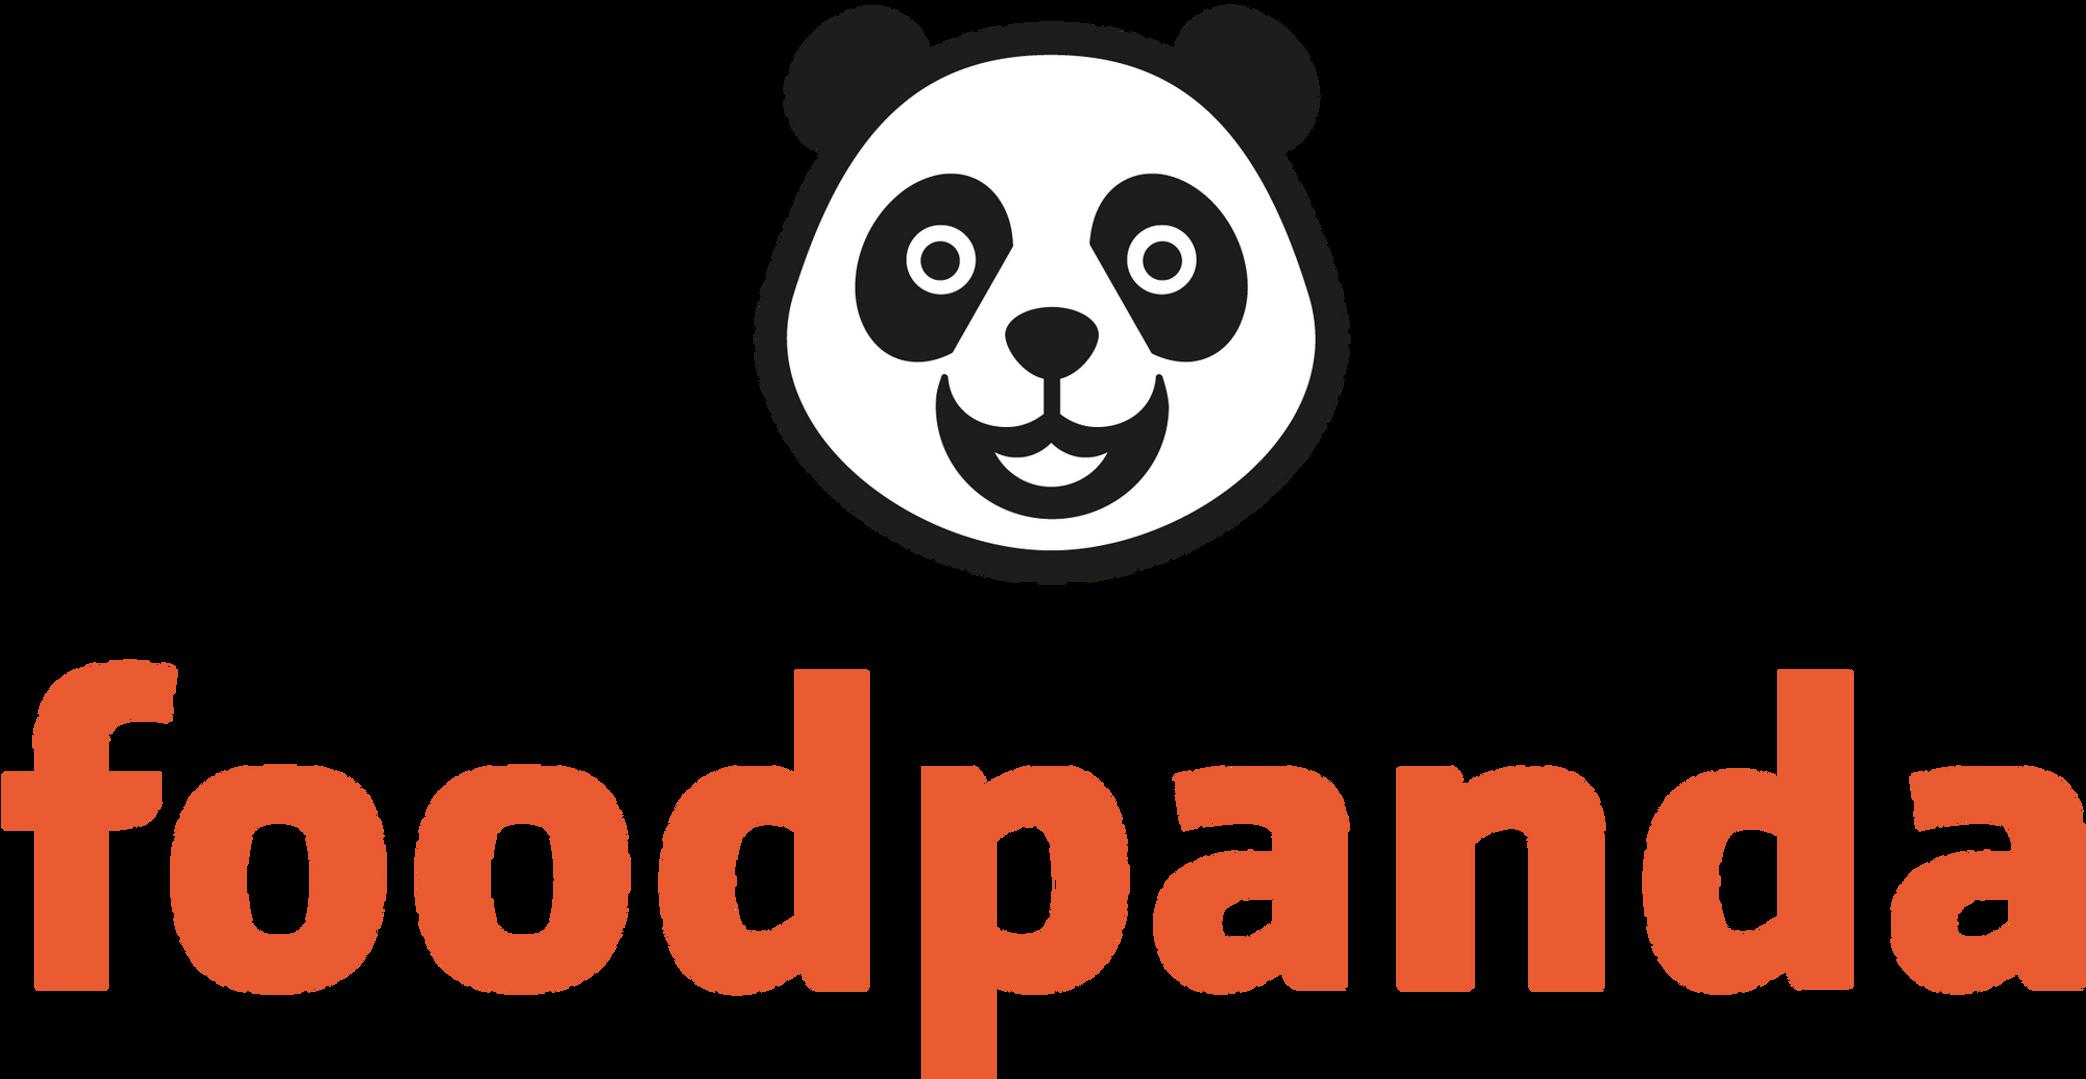 Foodpanda 印Tee.png